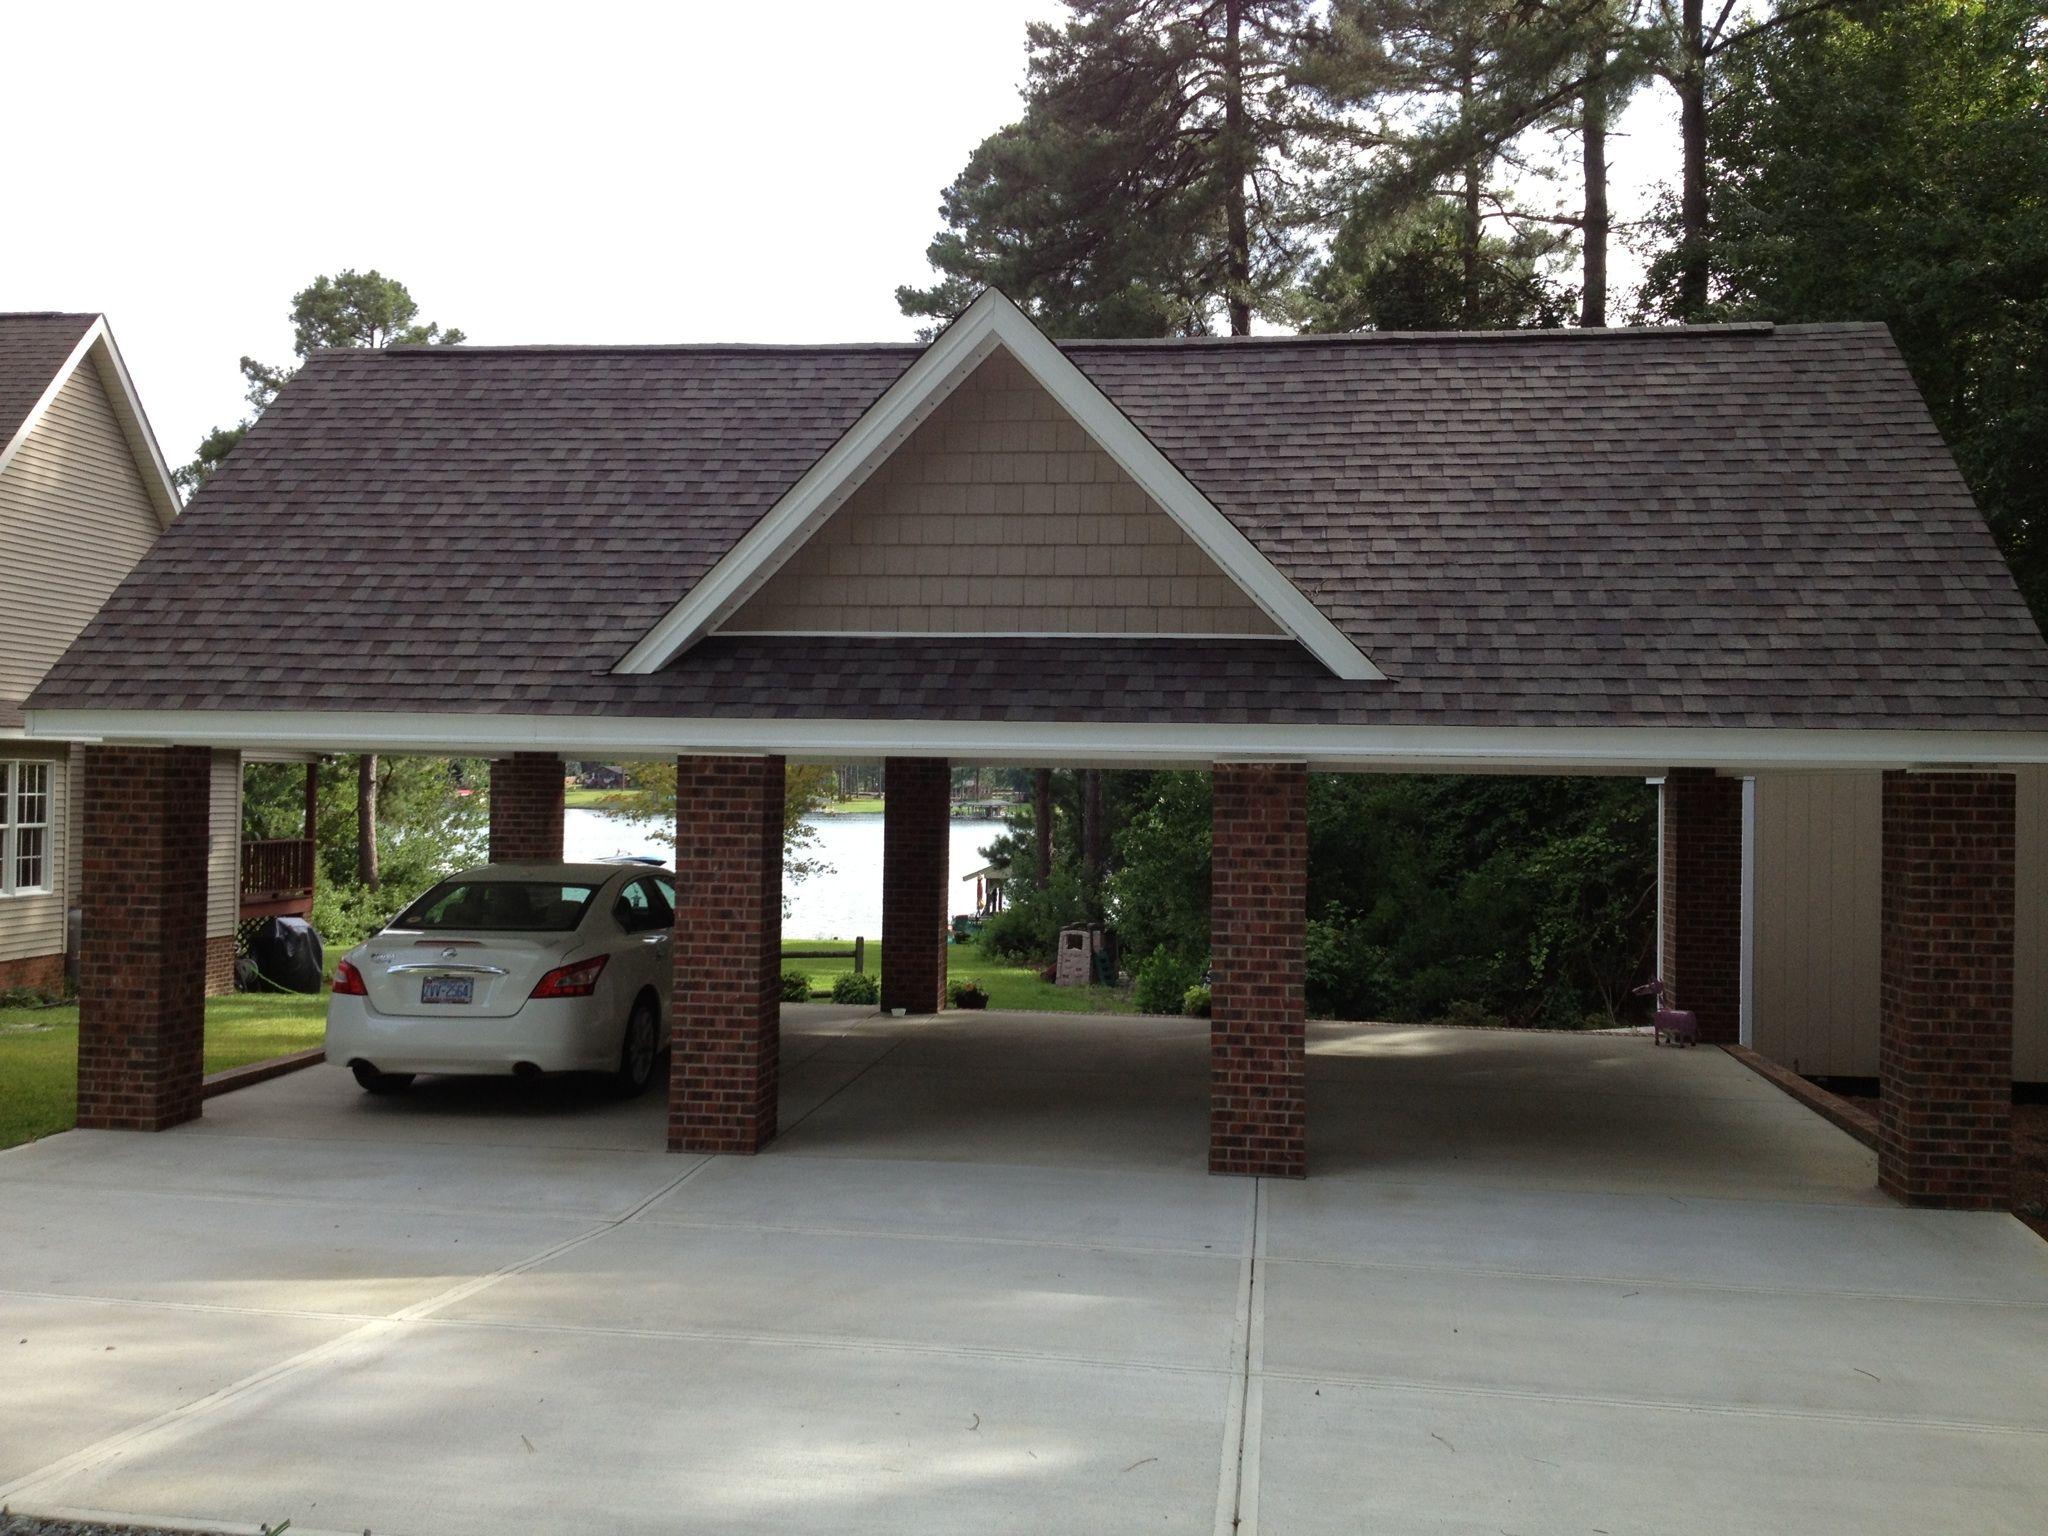 Carport Addition To Brick House Carport Addition Carport Carport Plans